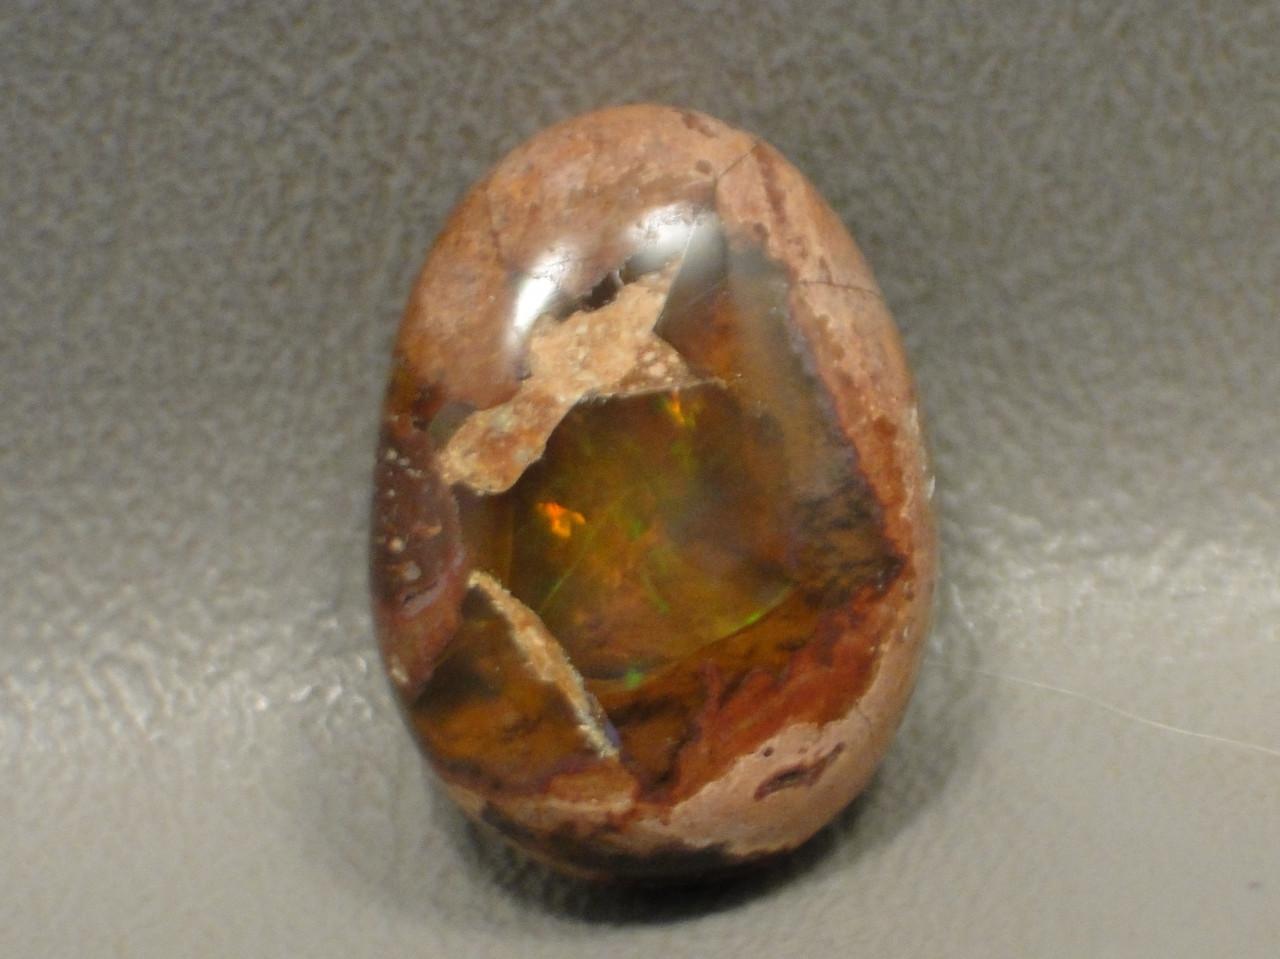 Iridescent Mexican Fire Opal Cabochon Semi Precious Gemstone #22